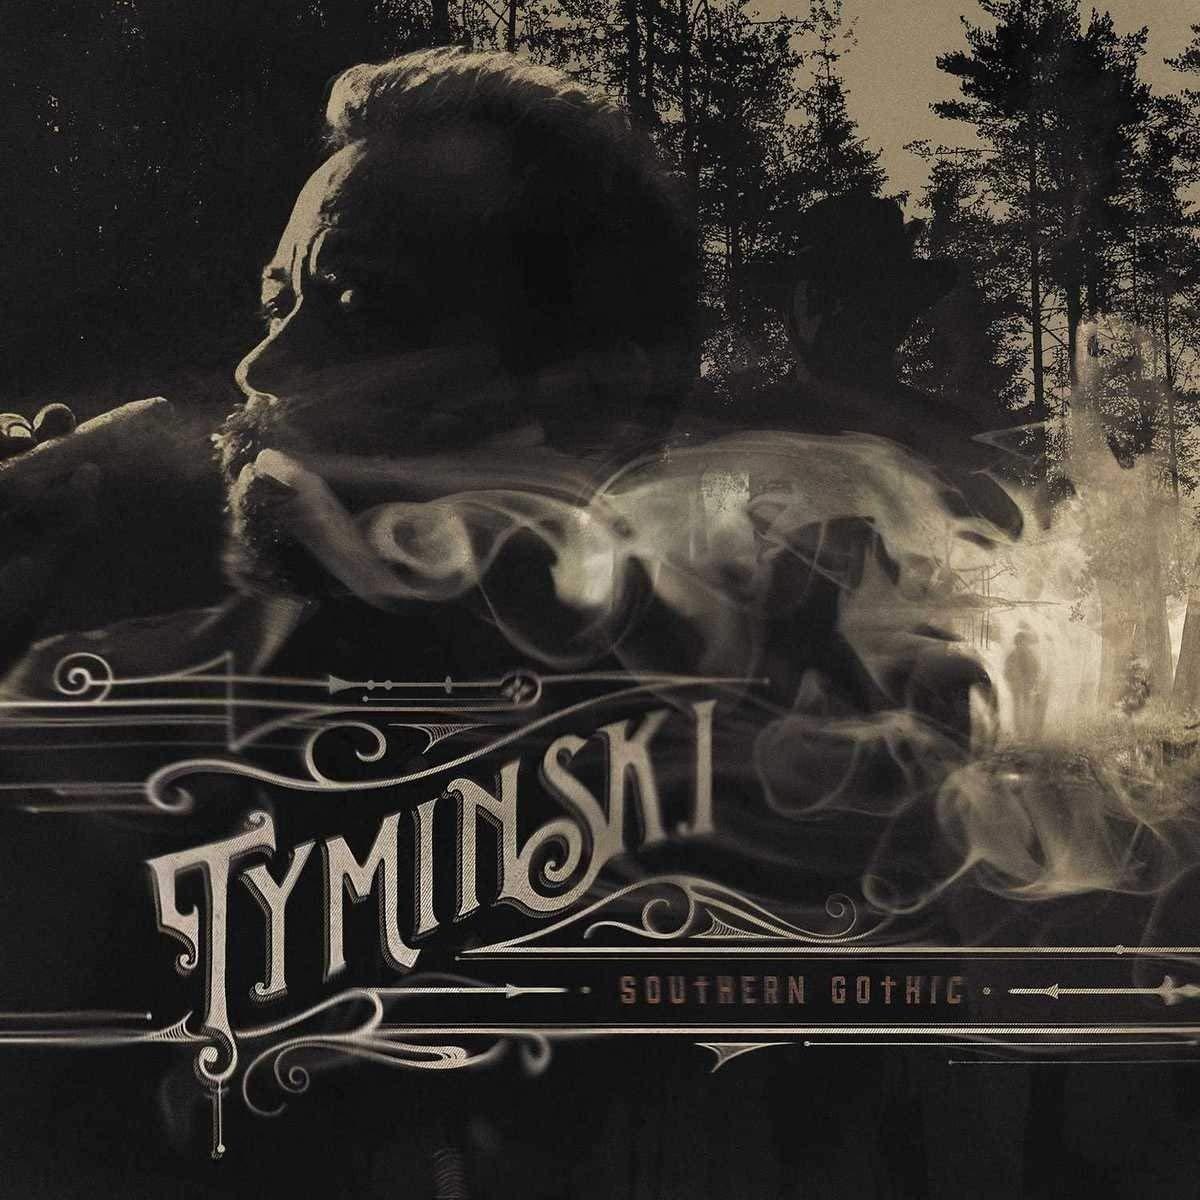 Tyminski - Southern Gothic